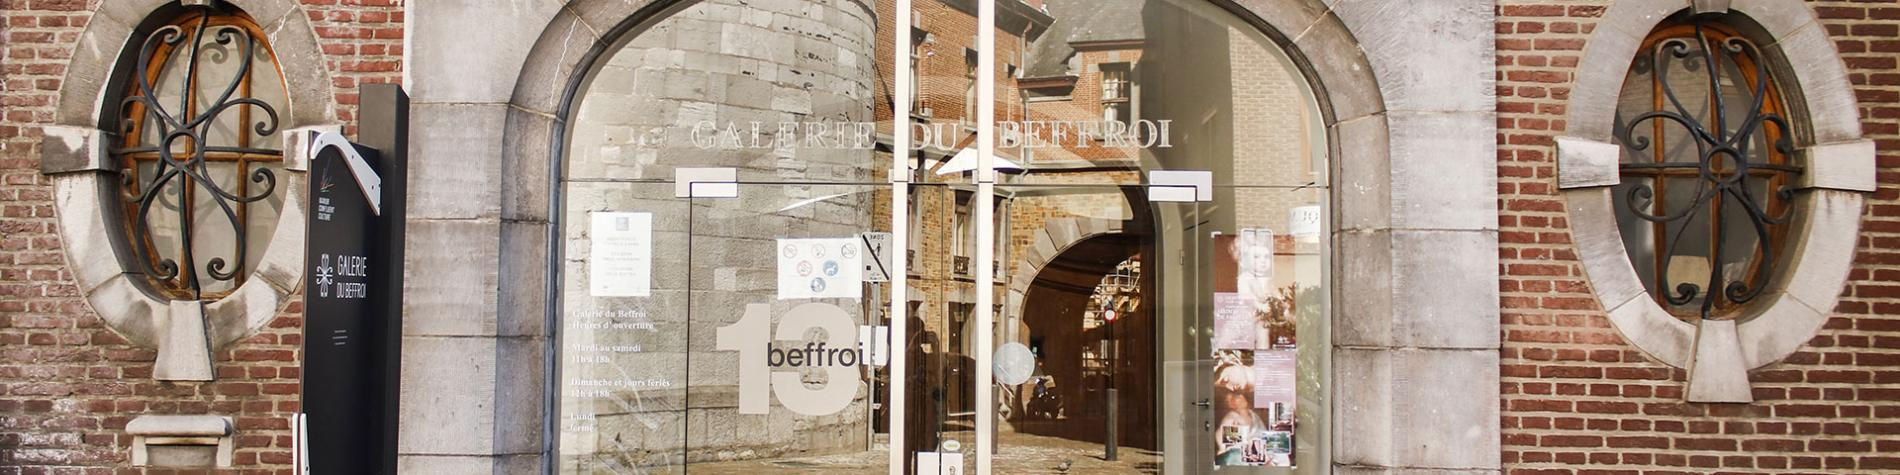 Galerie - Beffroi - Namur